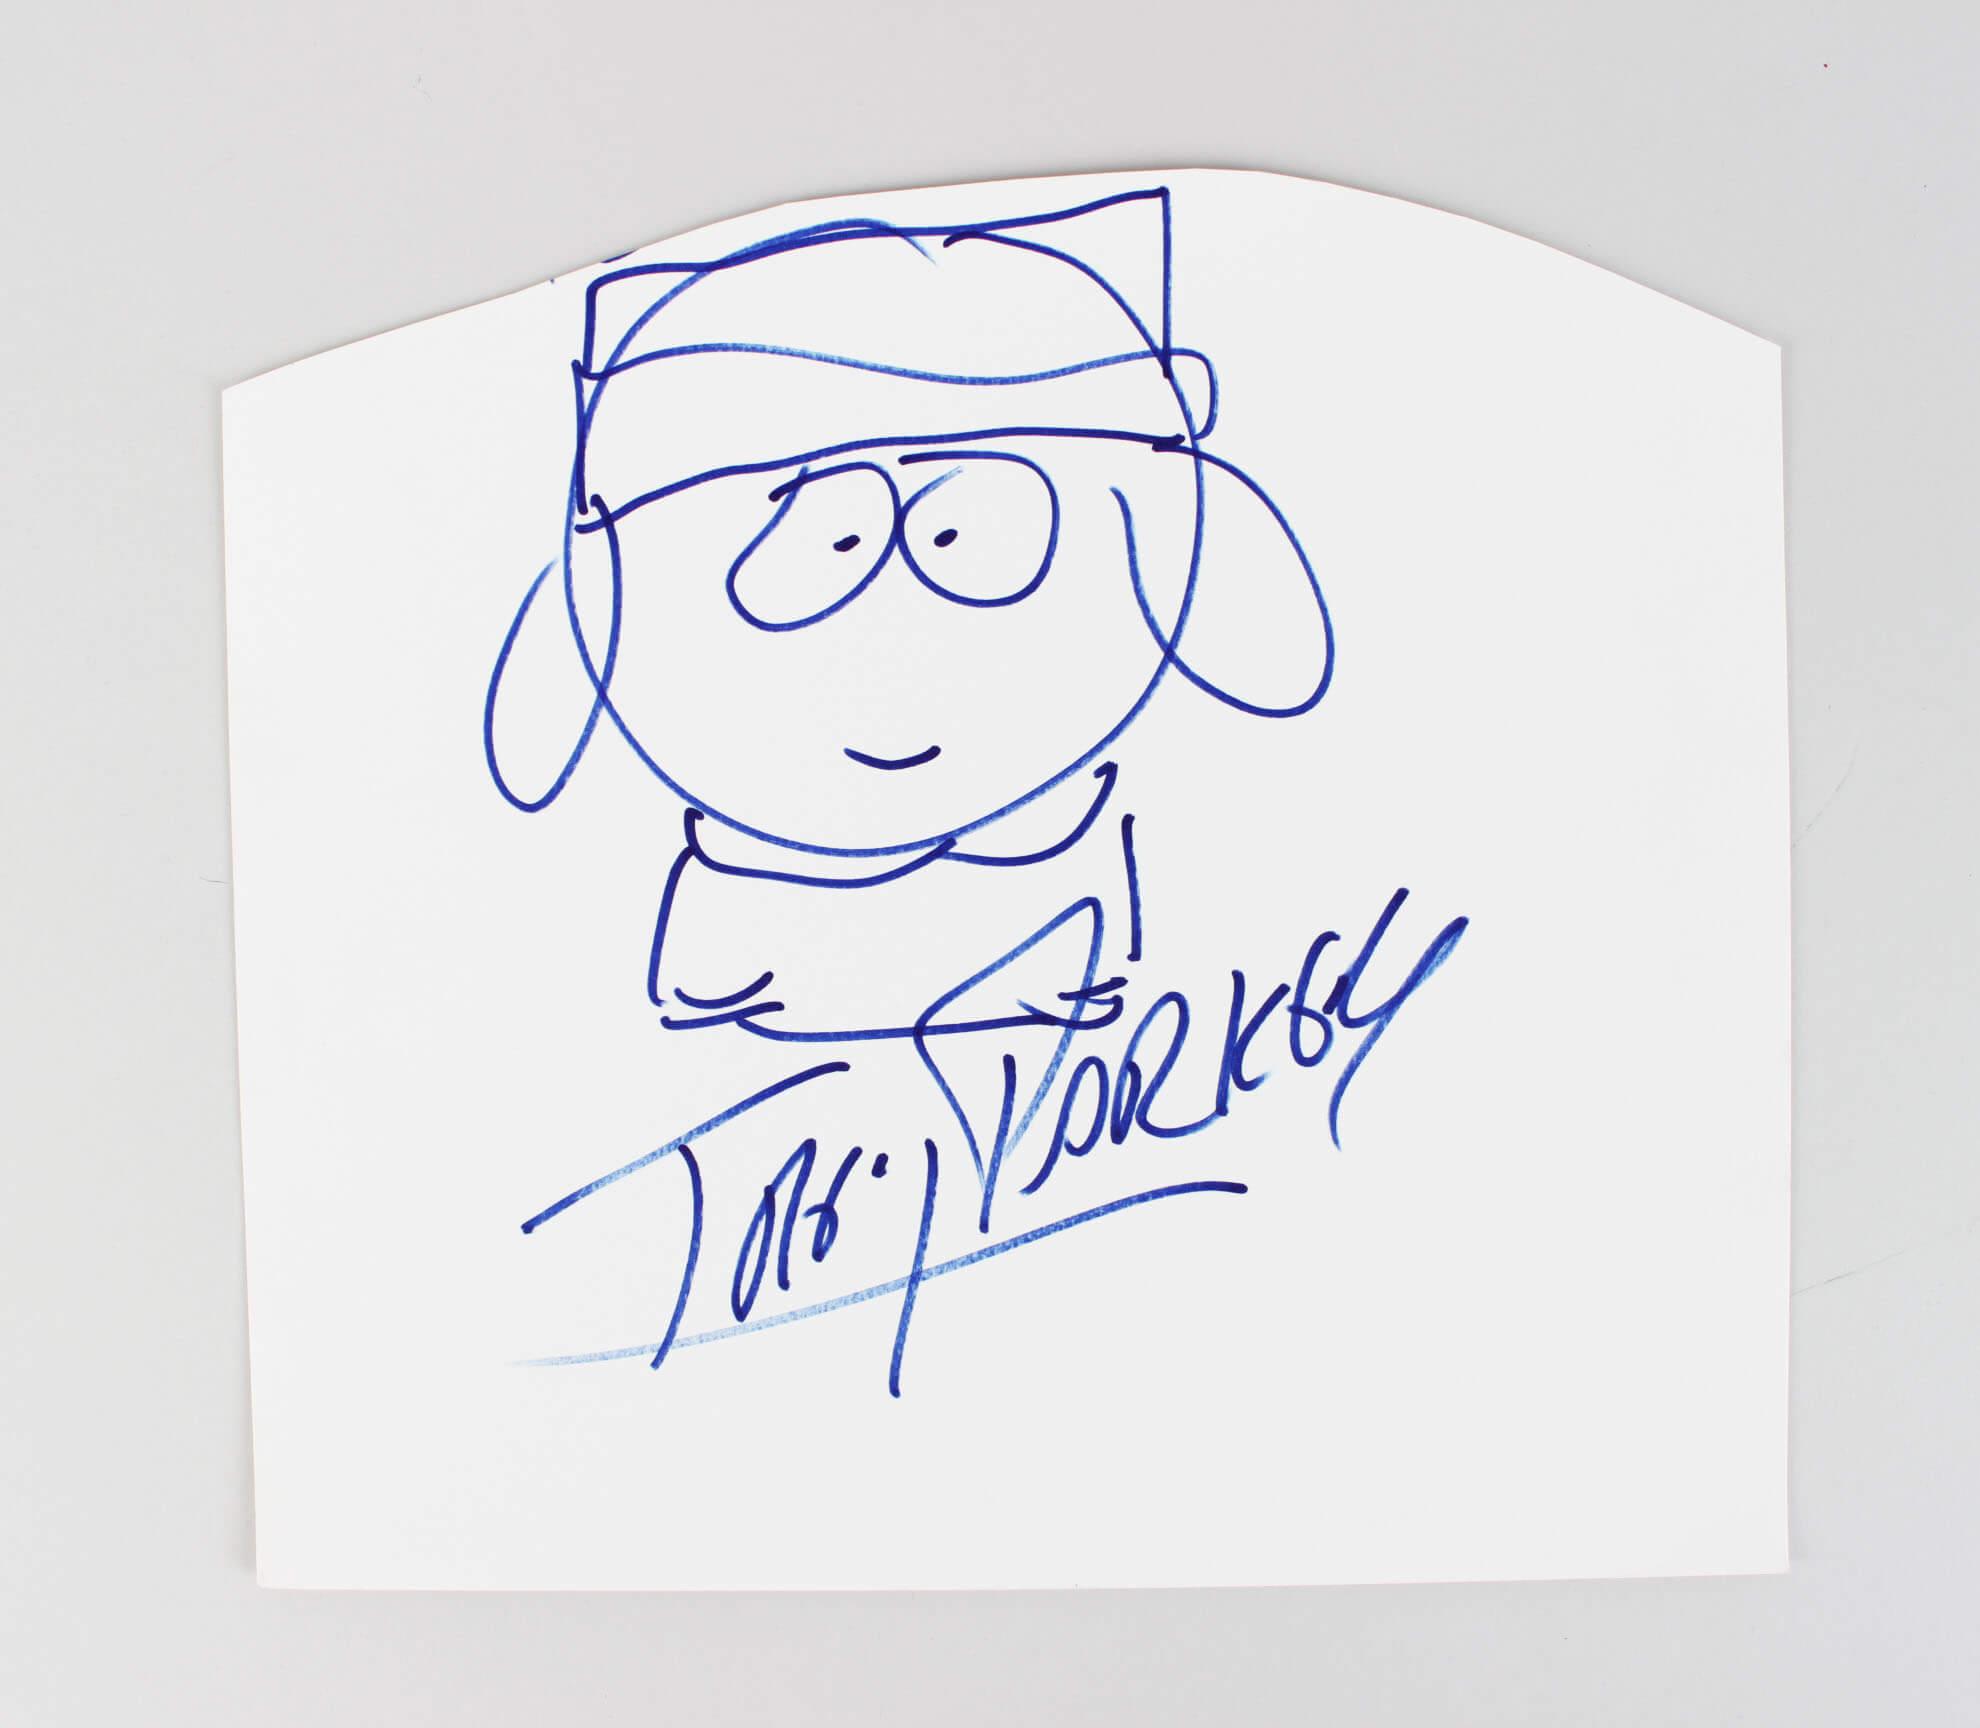 South Park - Trey Parker Signed & Hand Drawn Sketch of Kyle - COA